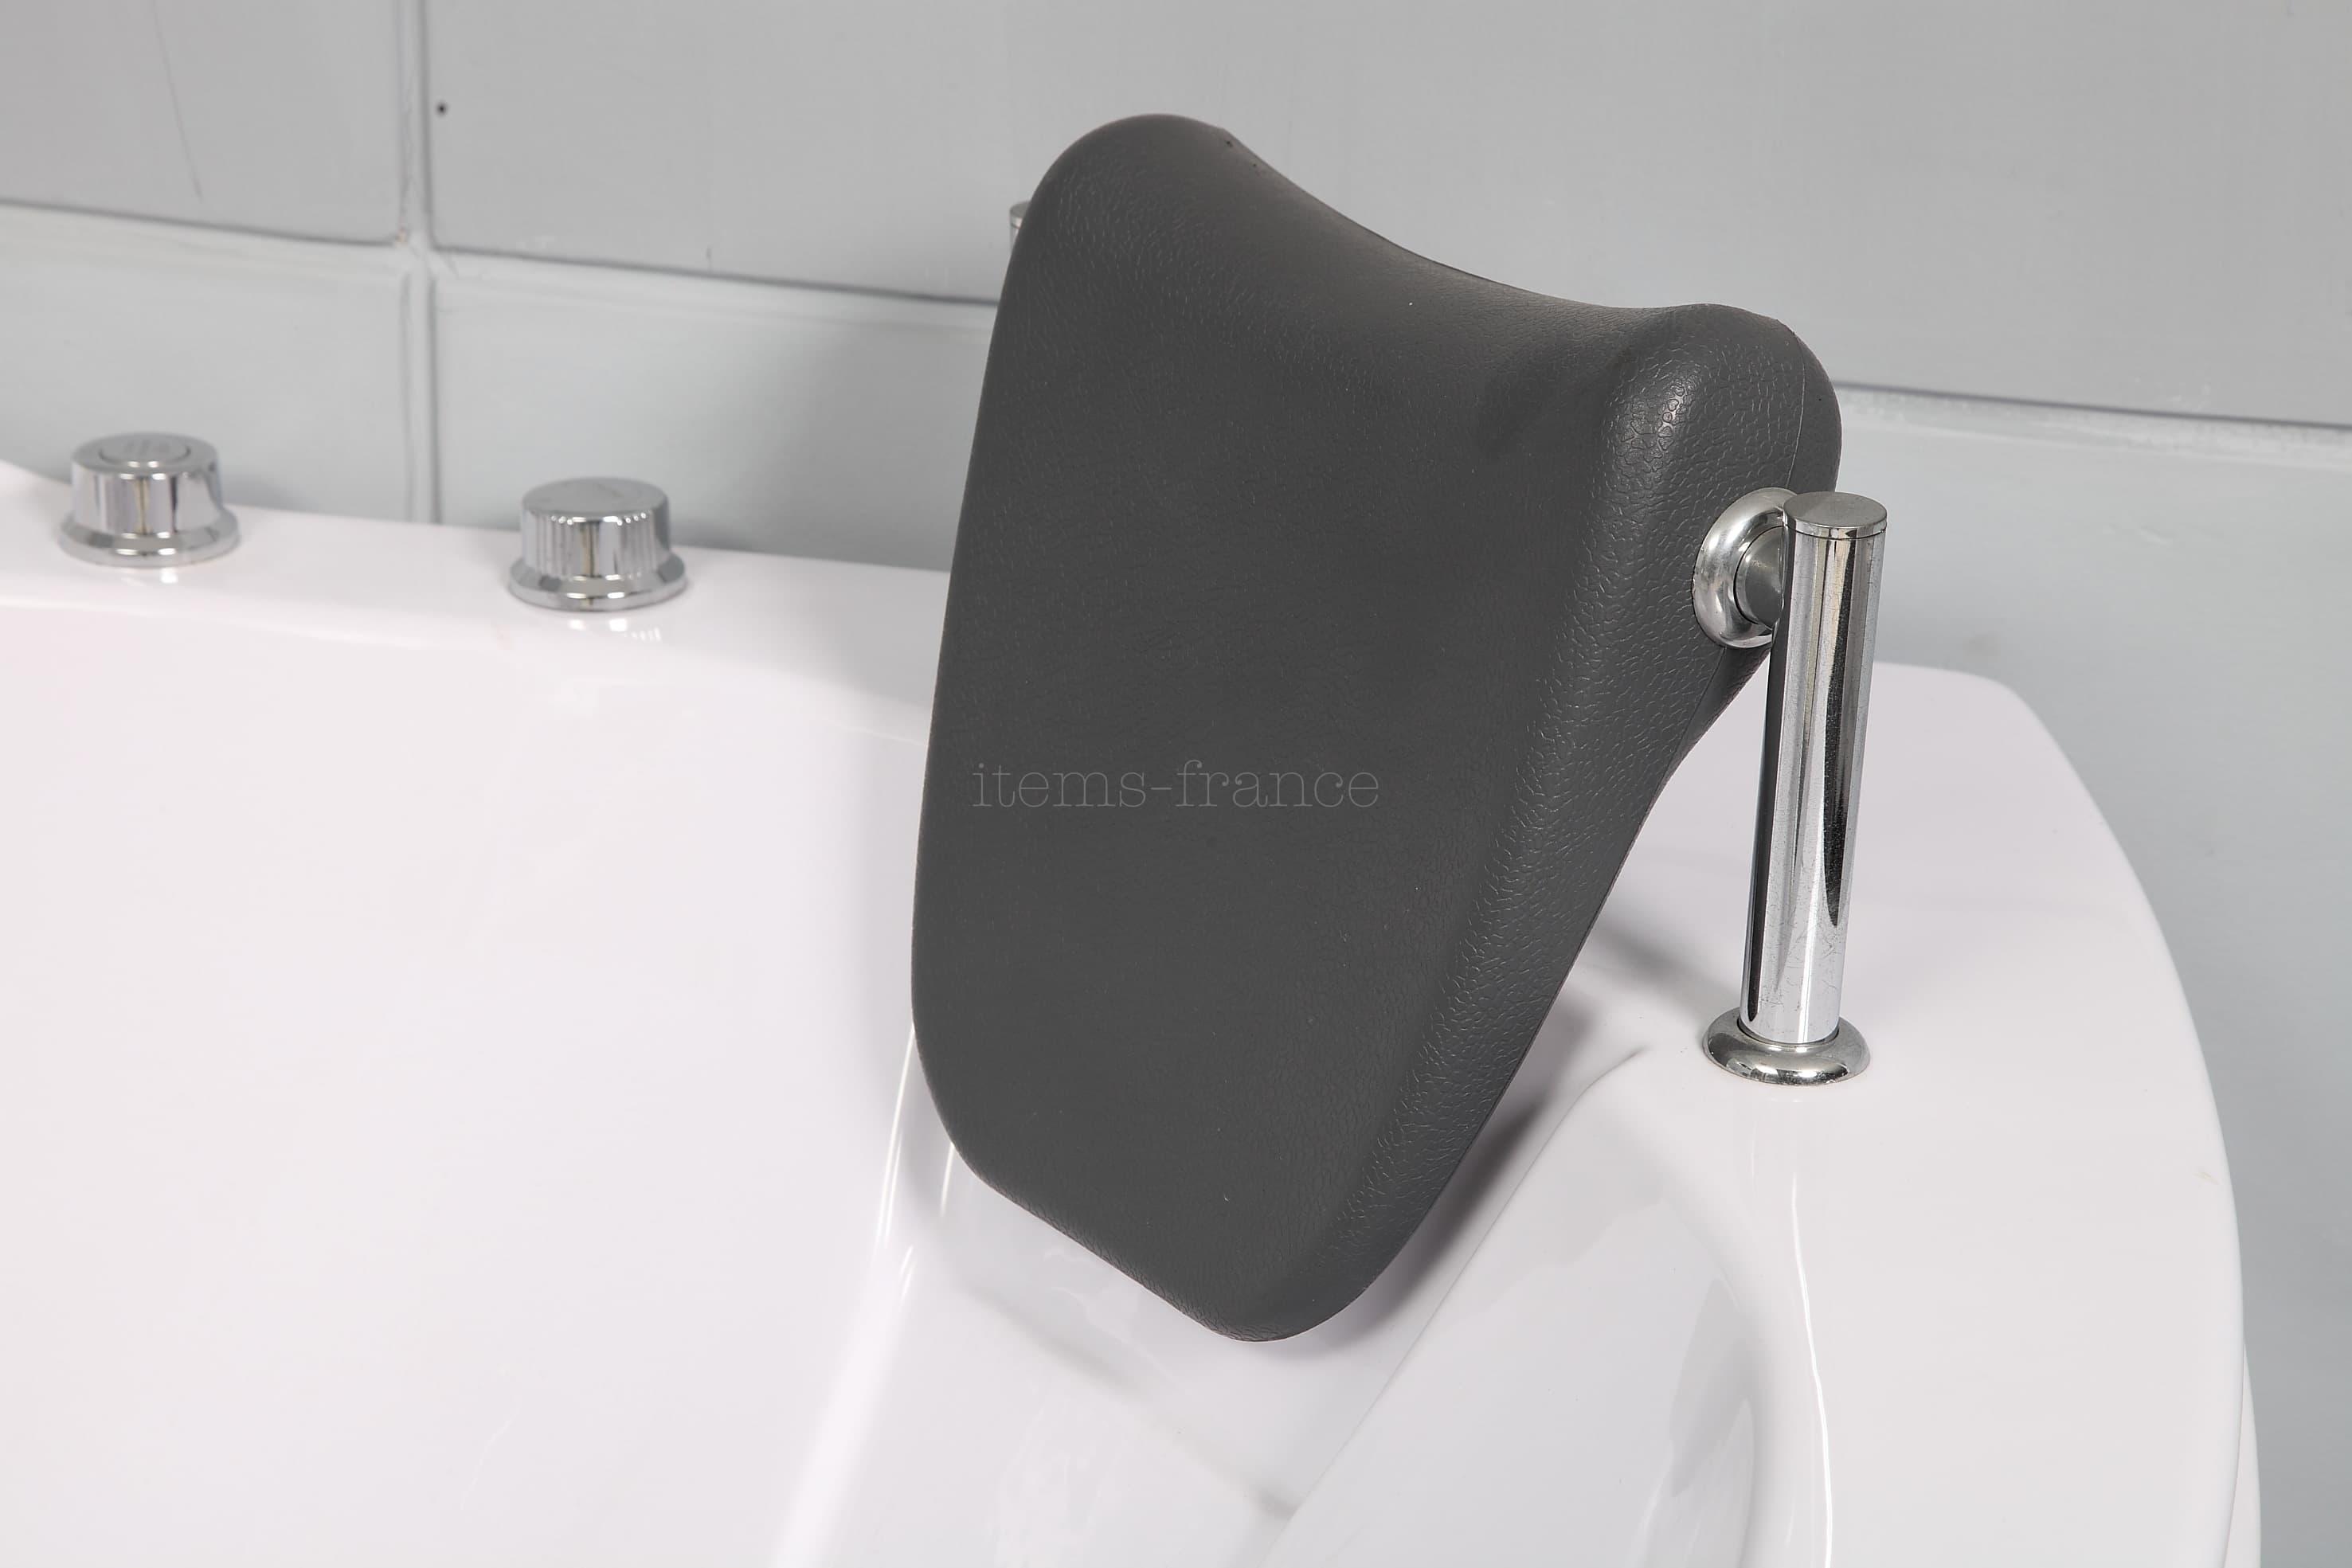 baignoire d angle salle de bain teouta baignoire. Black Bedroom Furniture Sets. Home Design Ideas